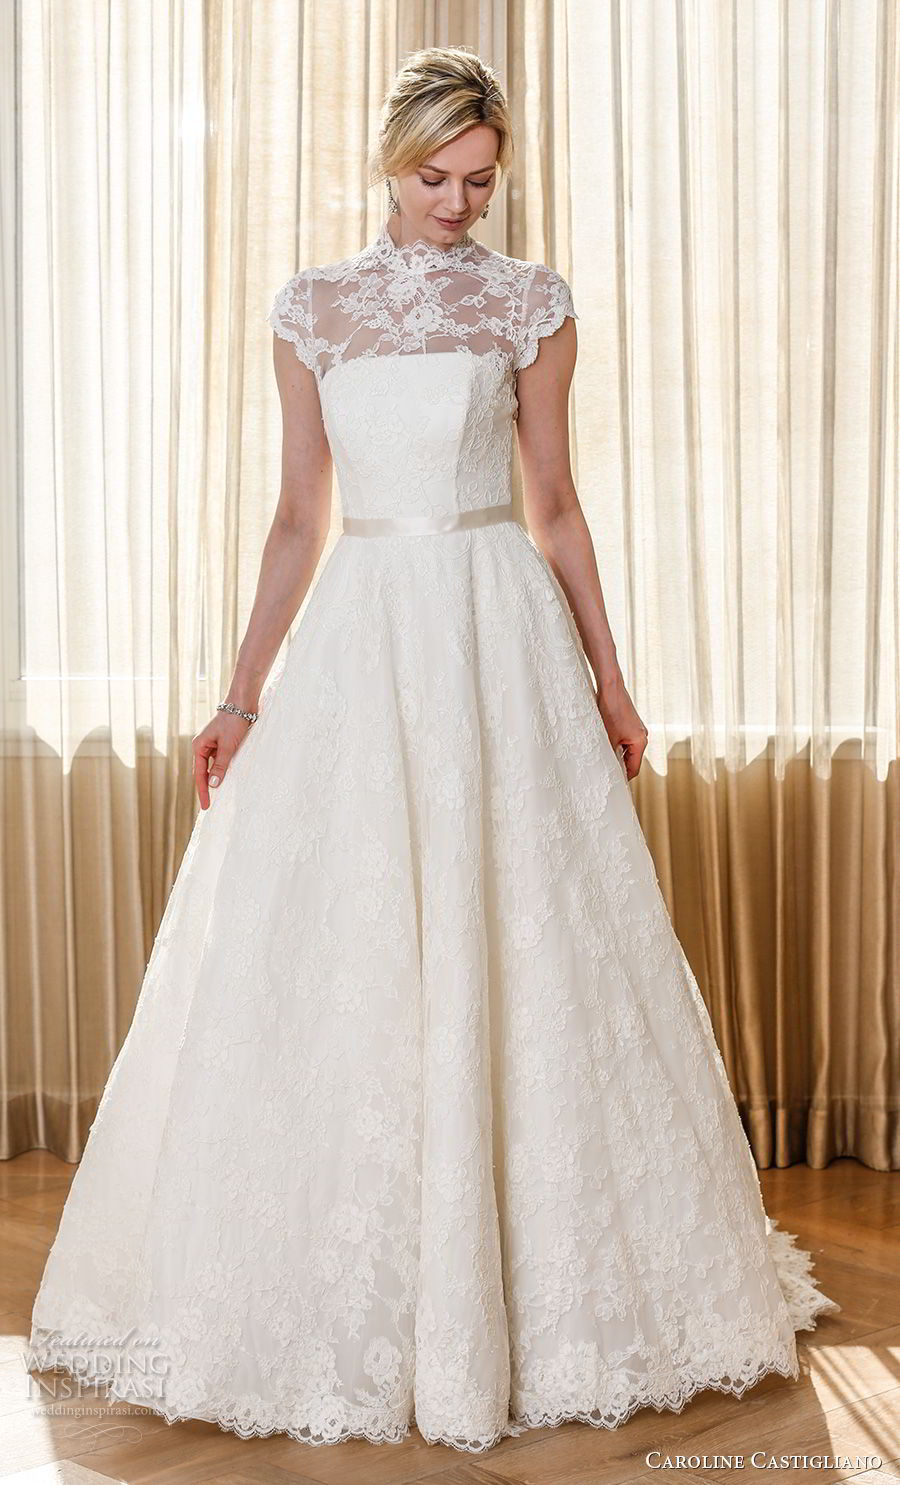 2019 Lace Long Sleeve Vintage A Line Party Dress: Caroline Castigliano 2019 Wedding Dresses